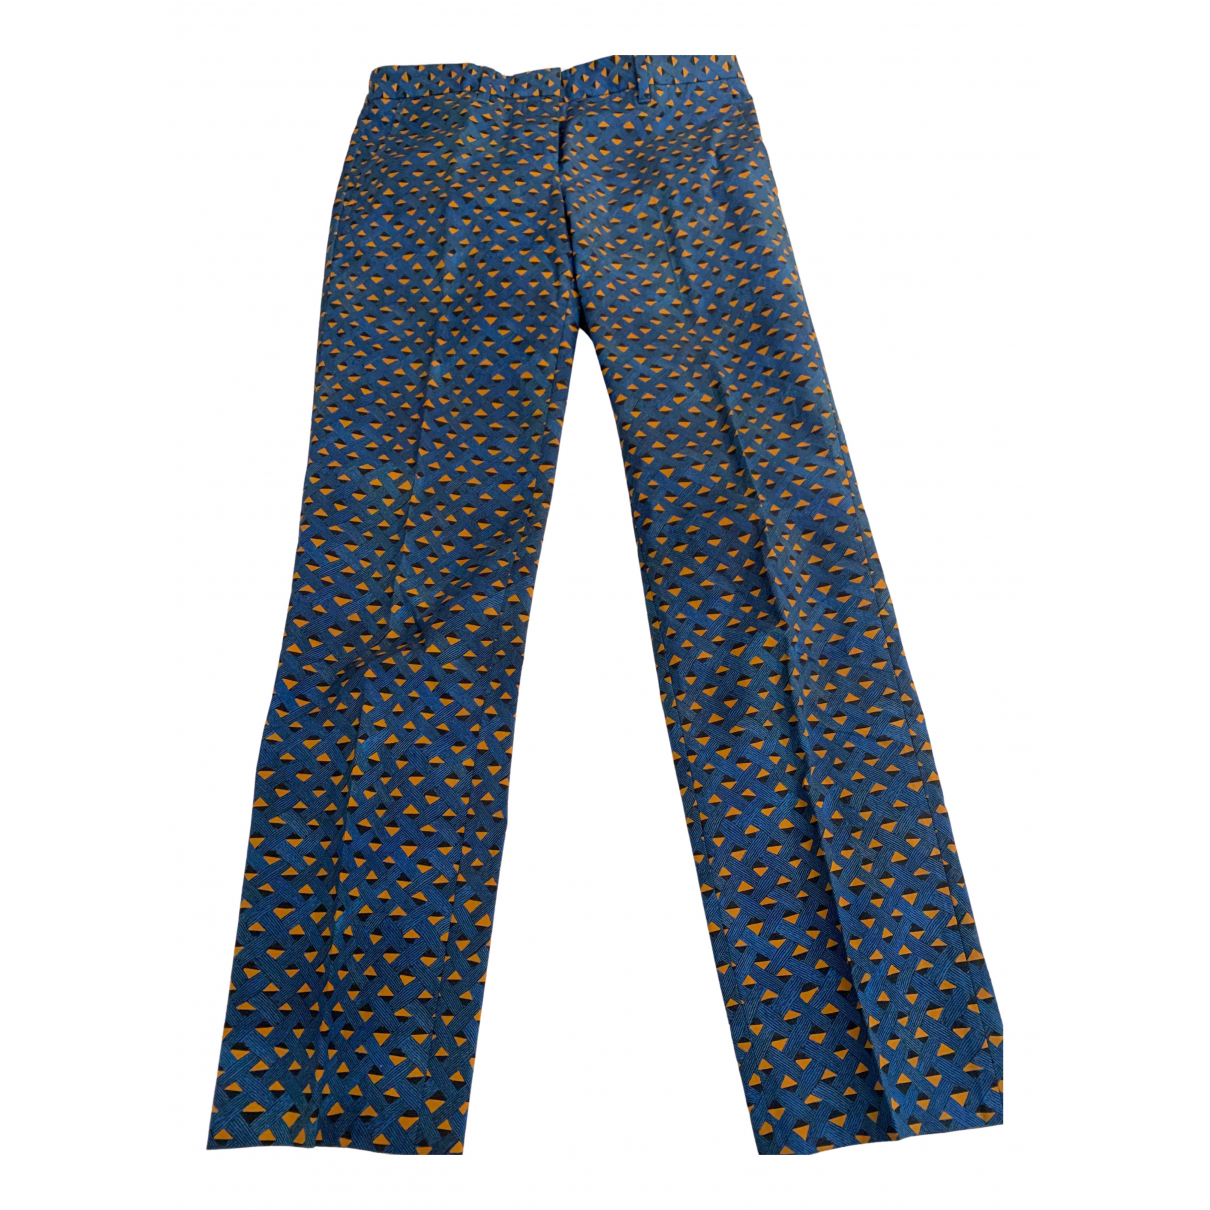 Mauro Grifoni - Pantalon   pour femme en coton - bleu